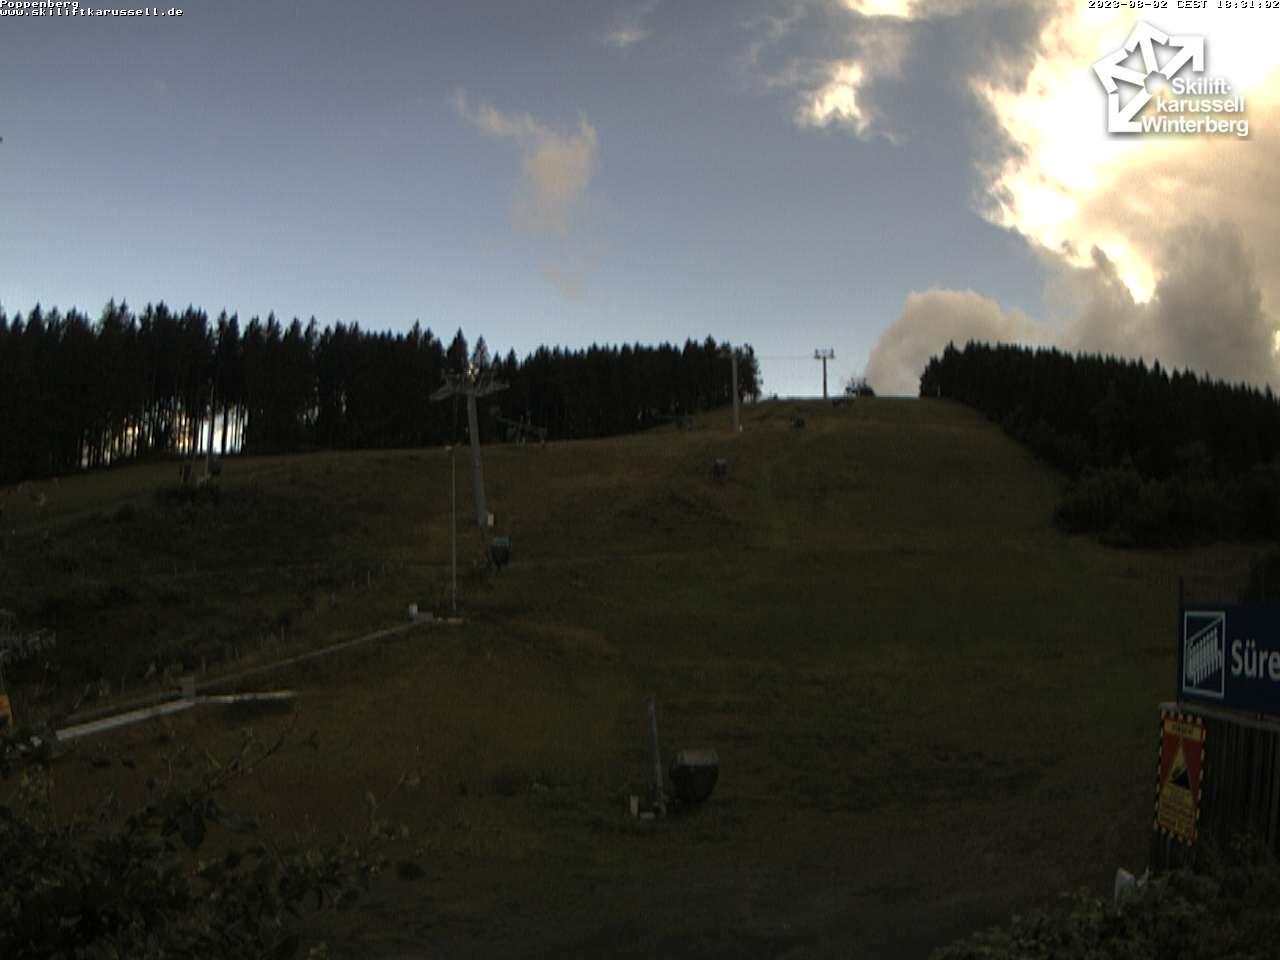 Webcam Poppenberg - Skiliftkarussell Winterberg